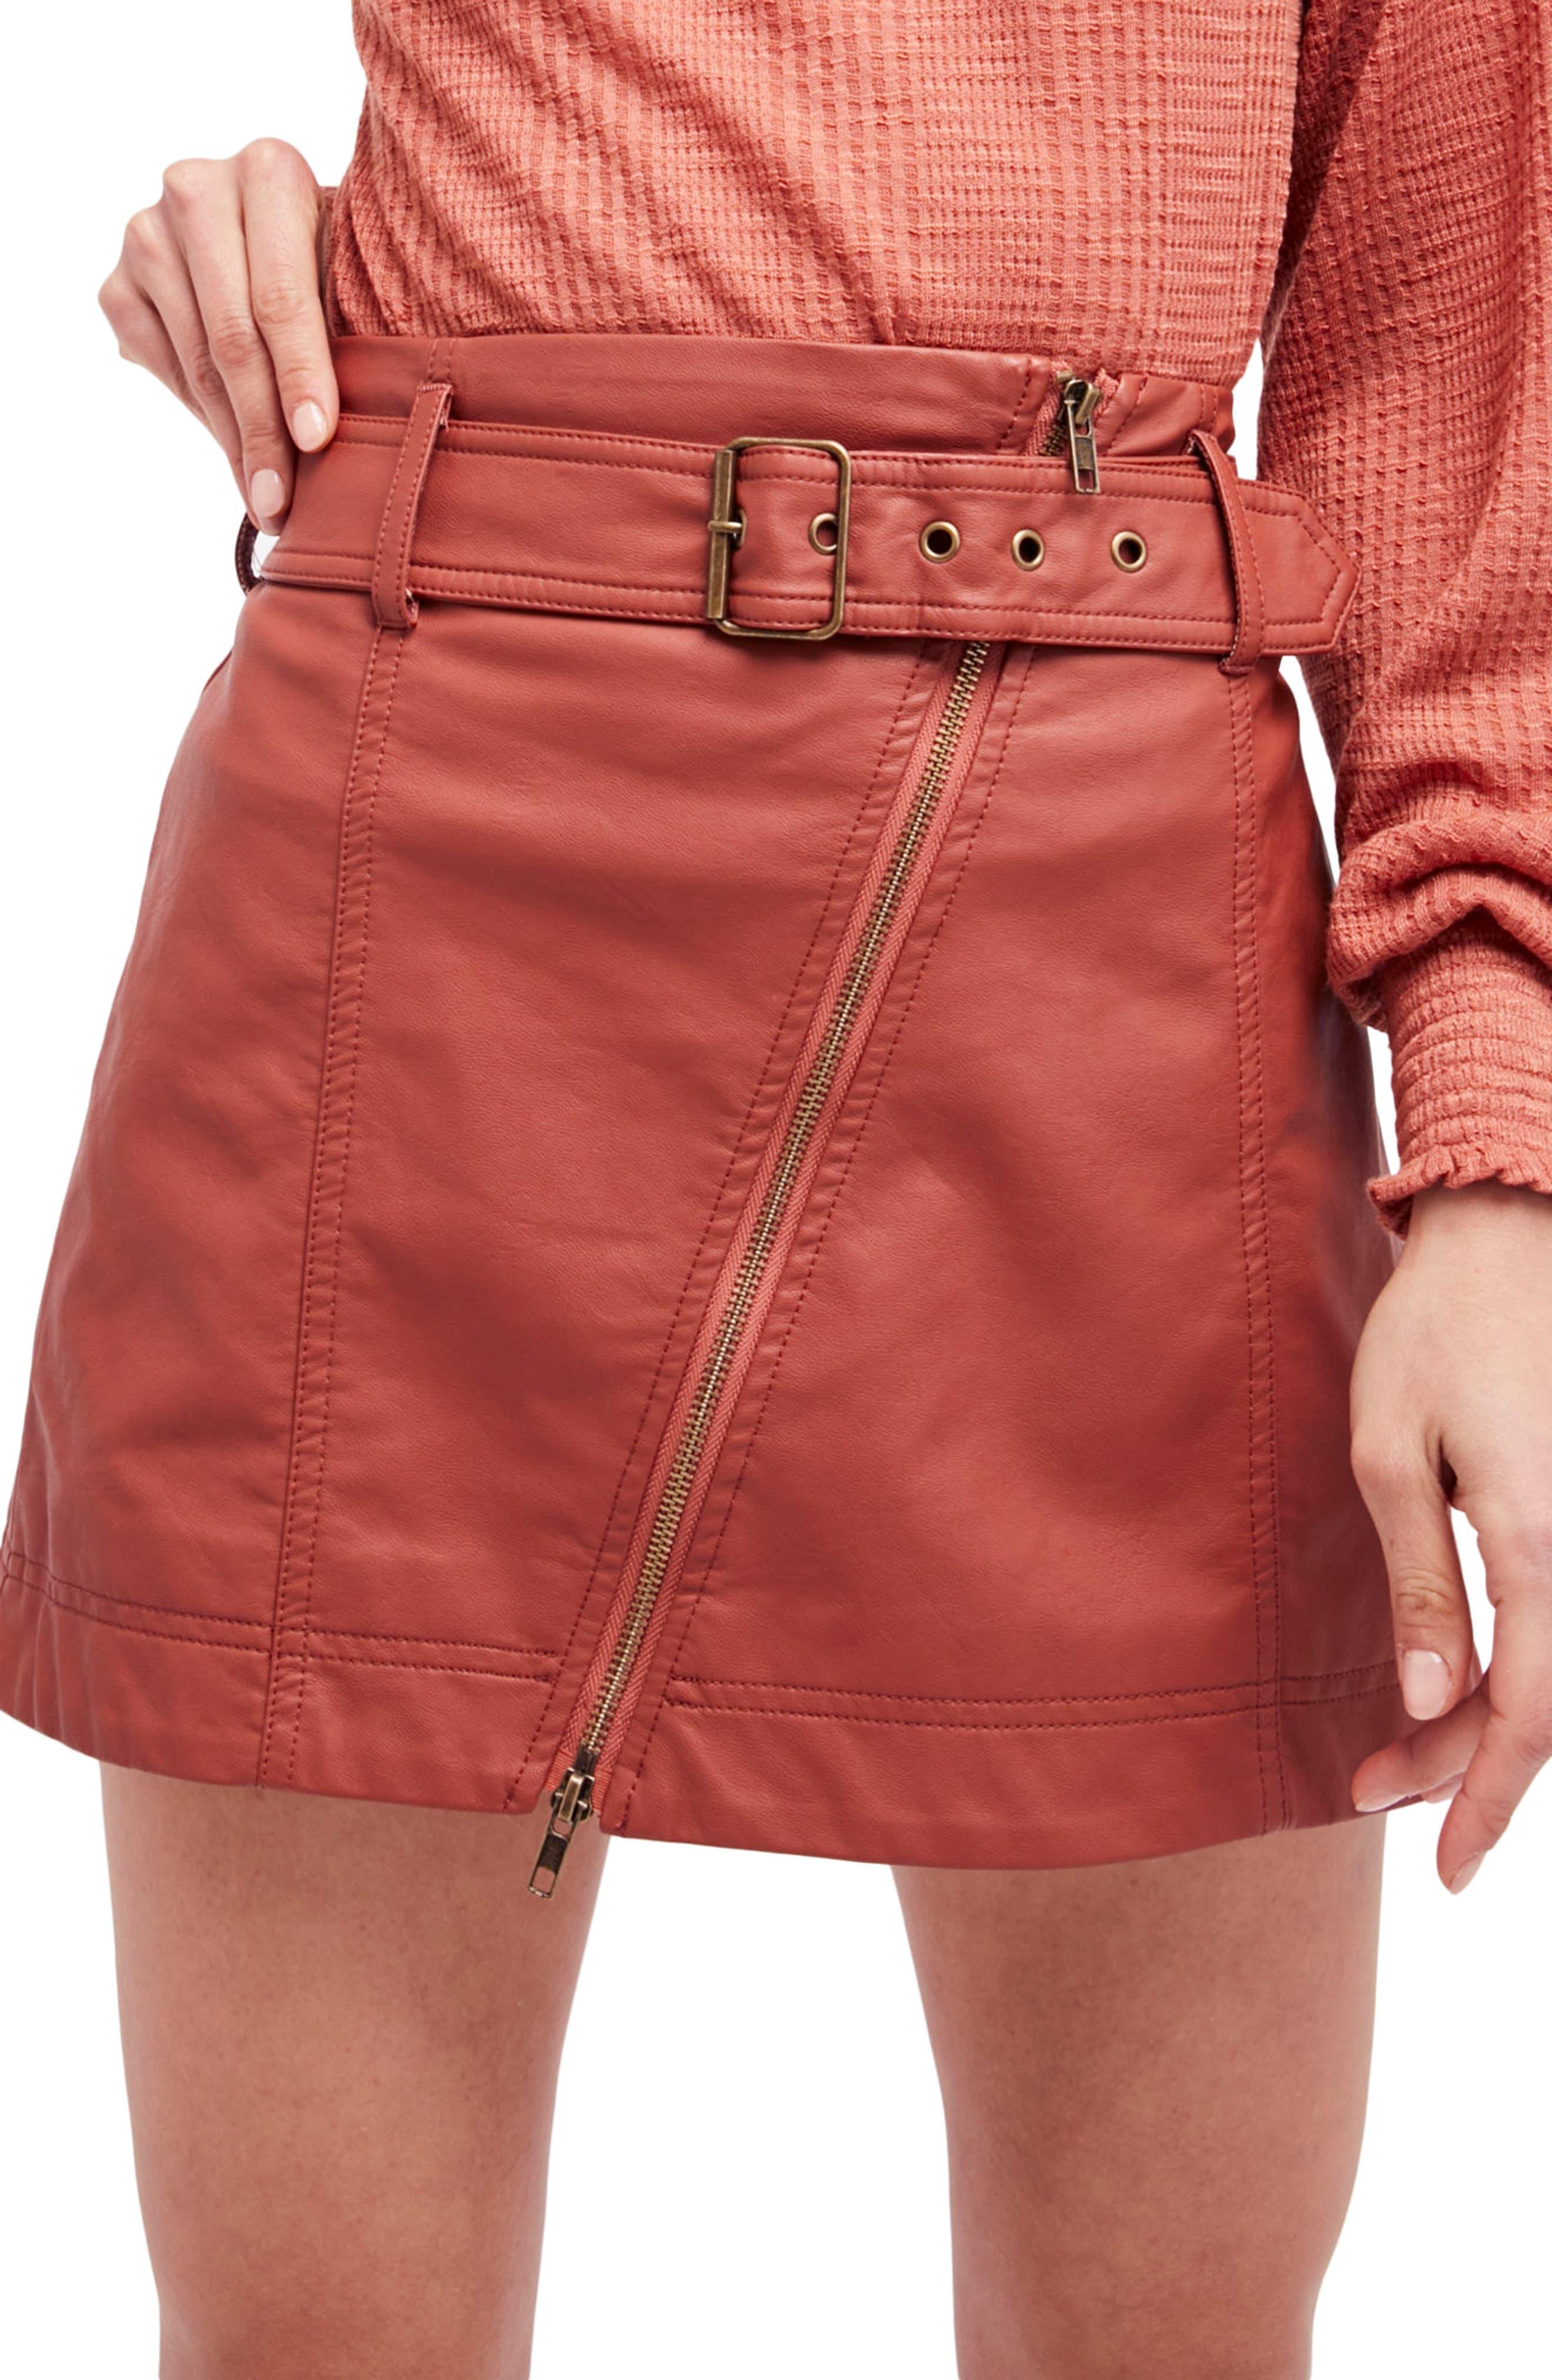 FREE PEOPLE Feelin Fresh Faux Leather Moto Skirt